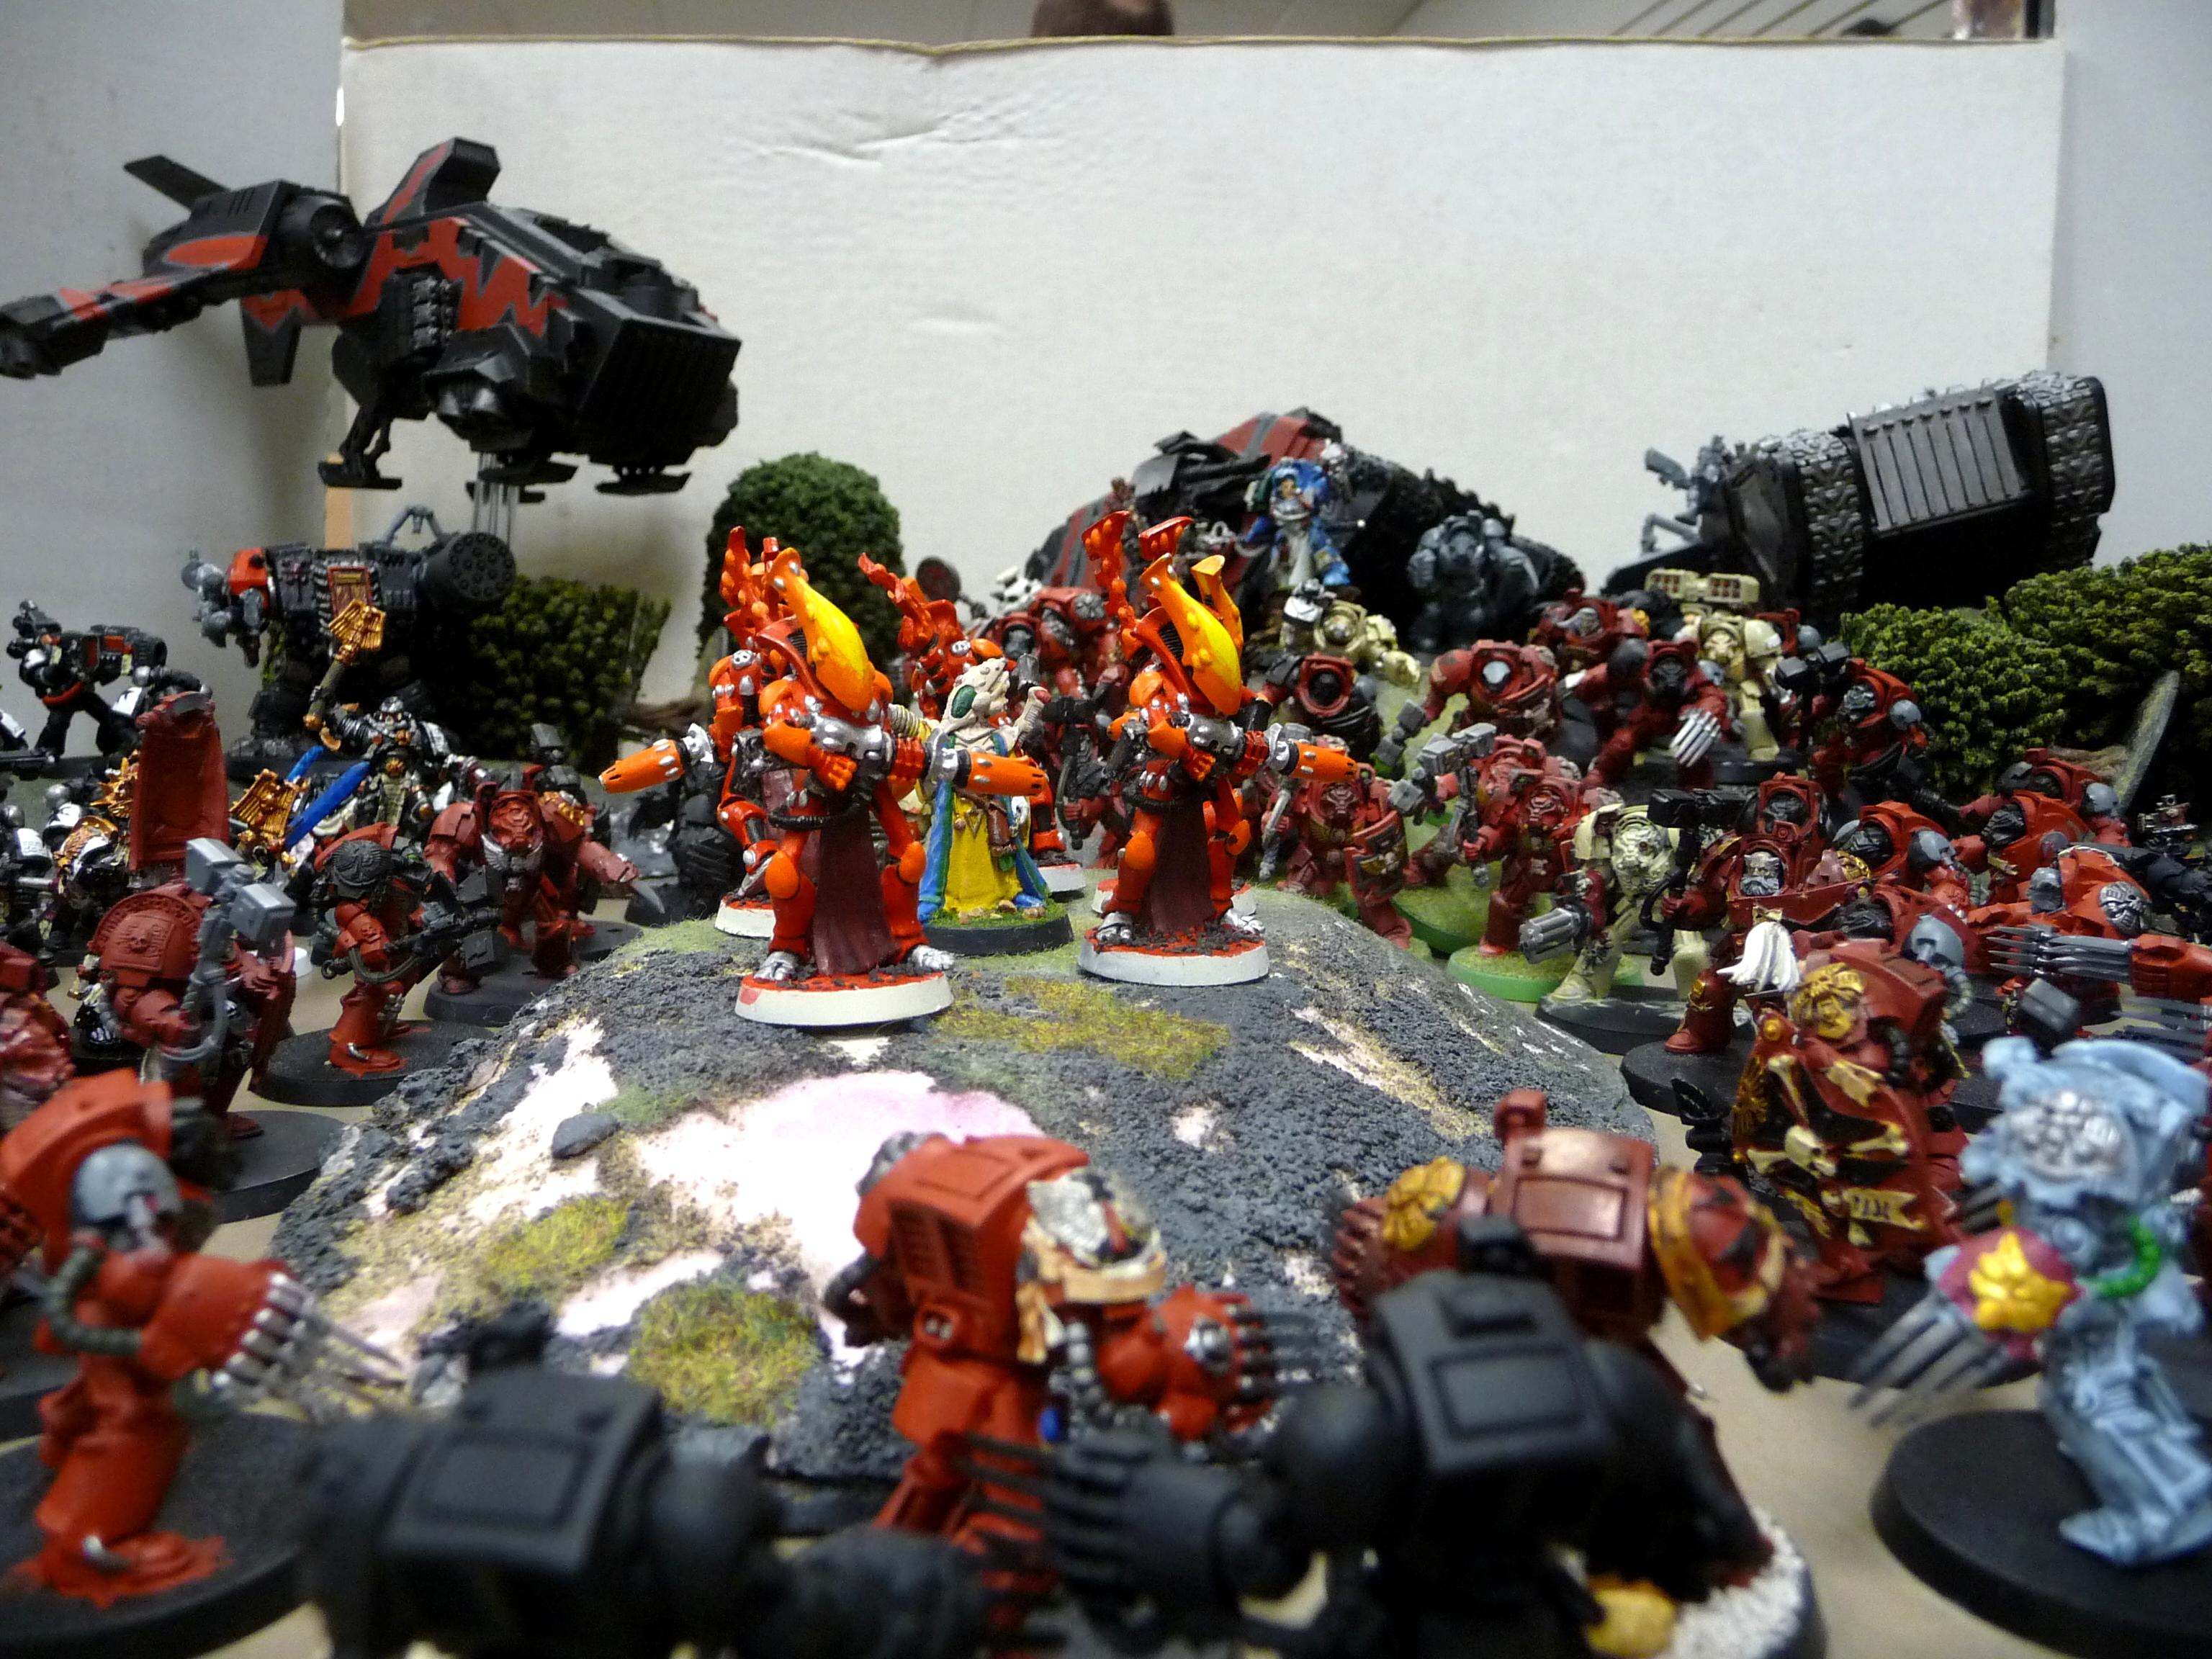 Black Templars, Blood Angeles, Dark Angeles, Eldar, Space Marines, Terminator Armor, Wraithguard